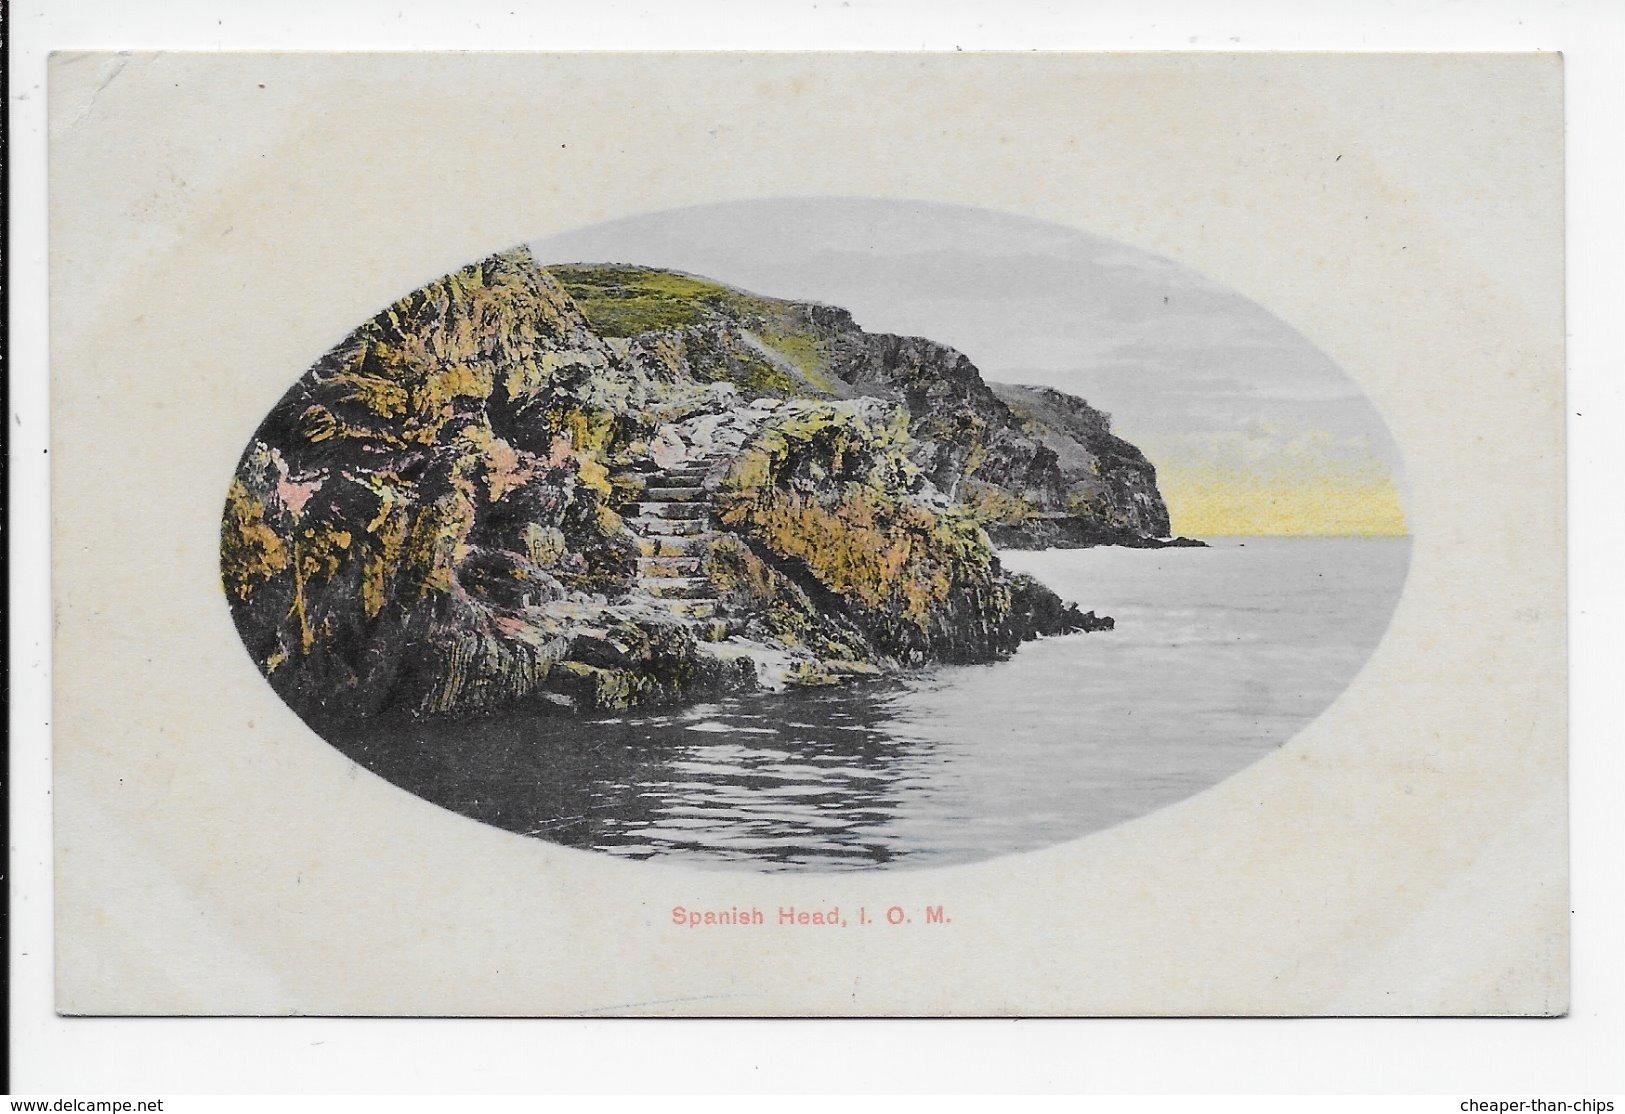 Spanish Head, I.O.M. - Prideaux - Isle Of Man